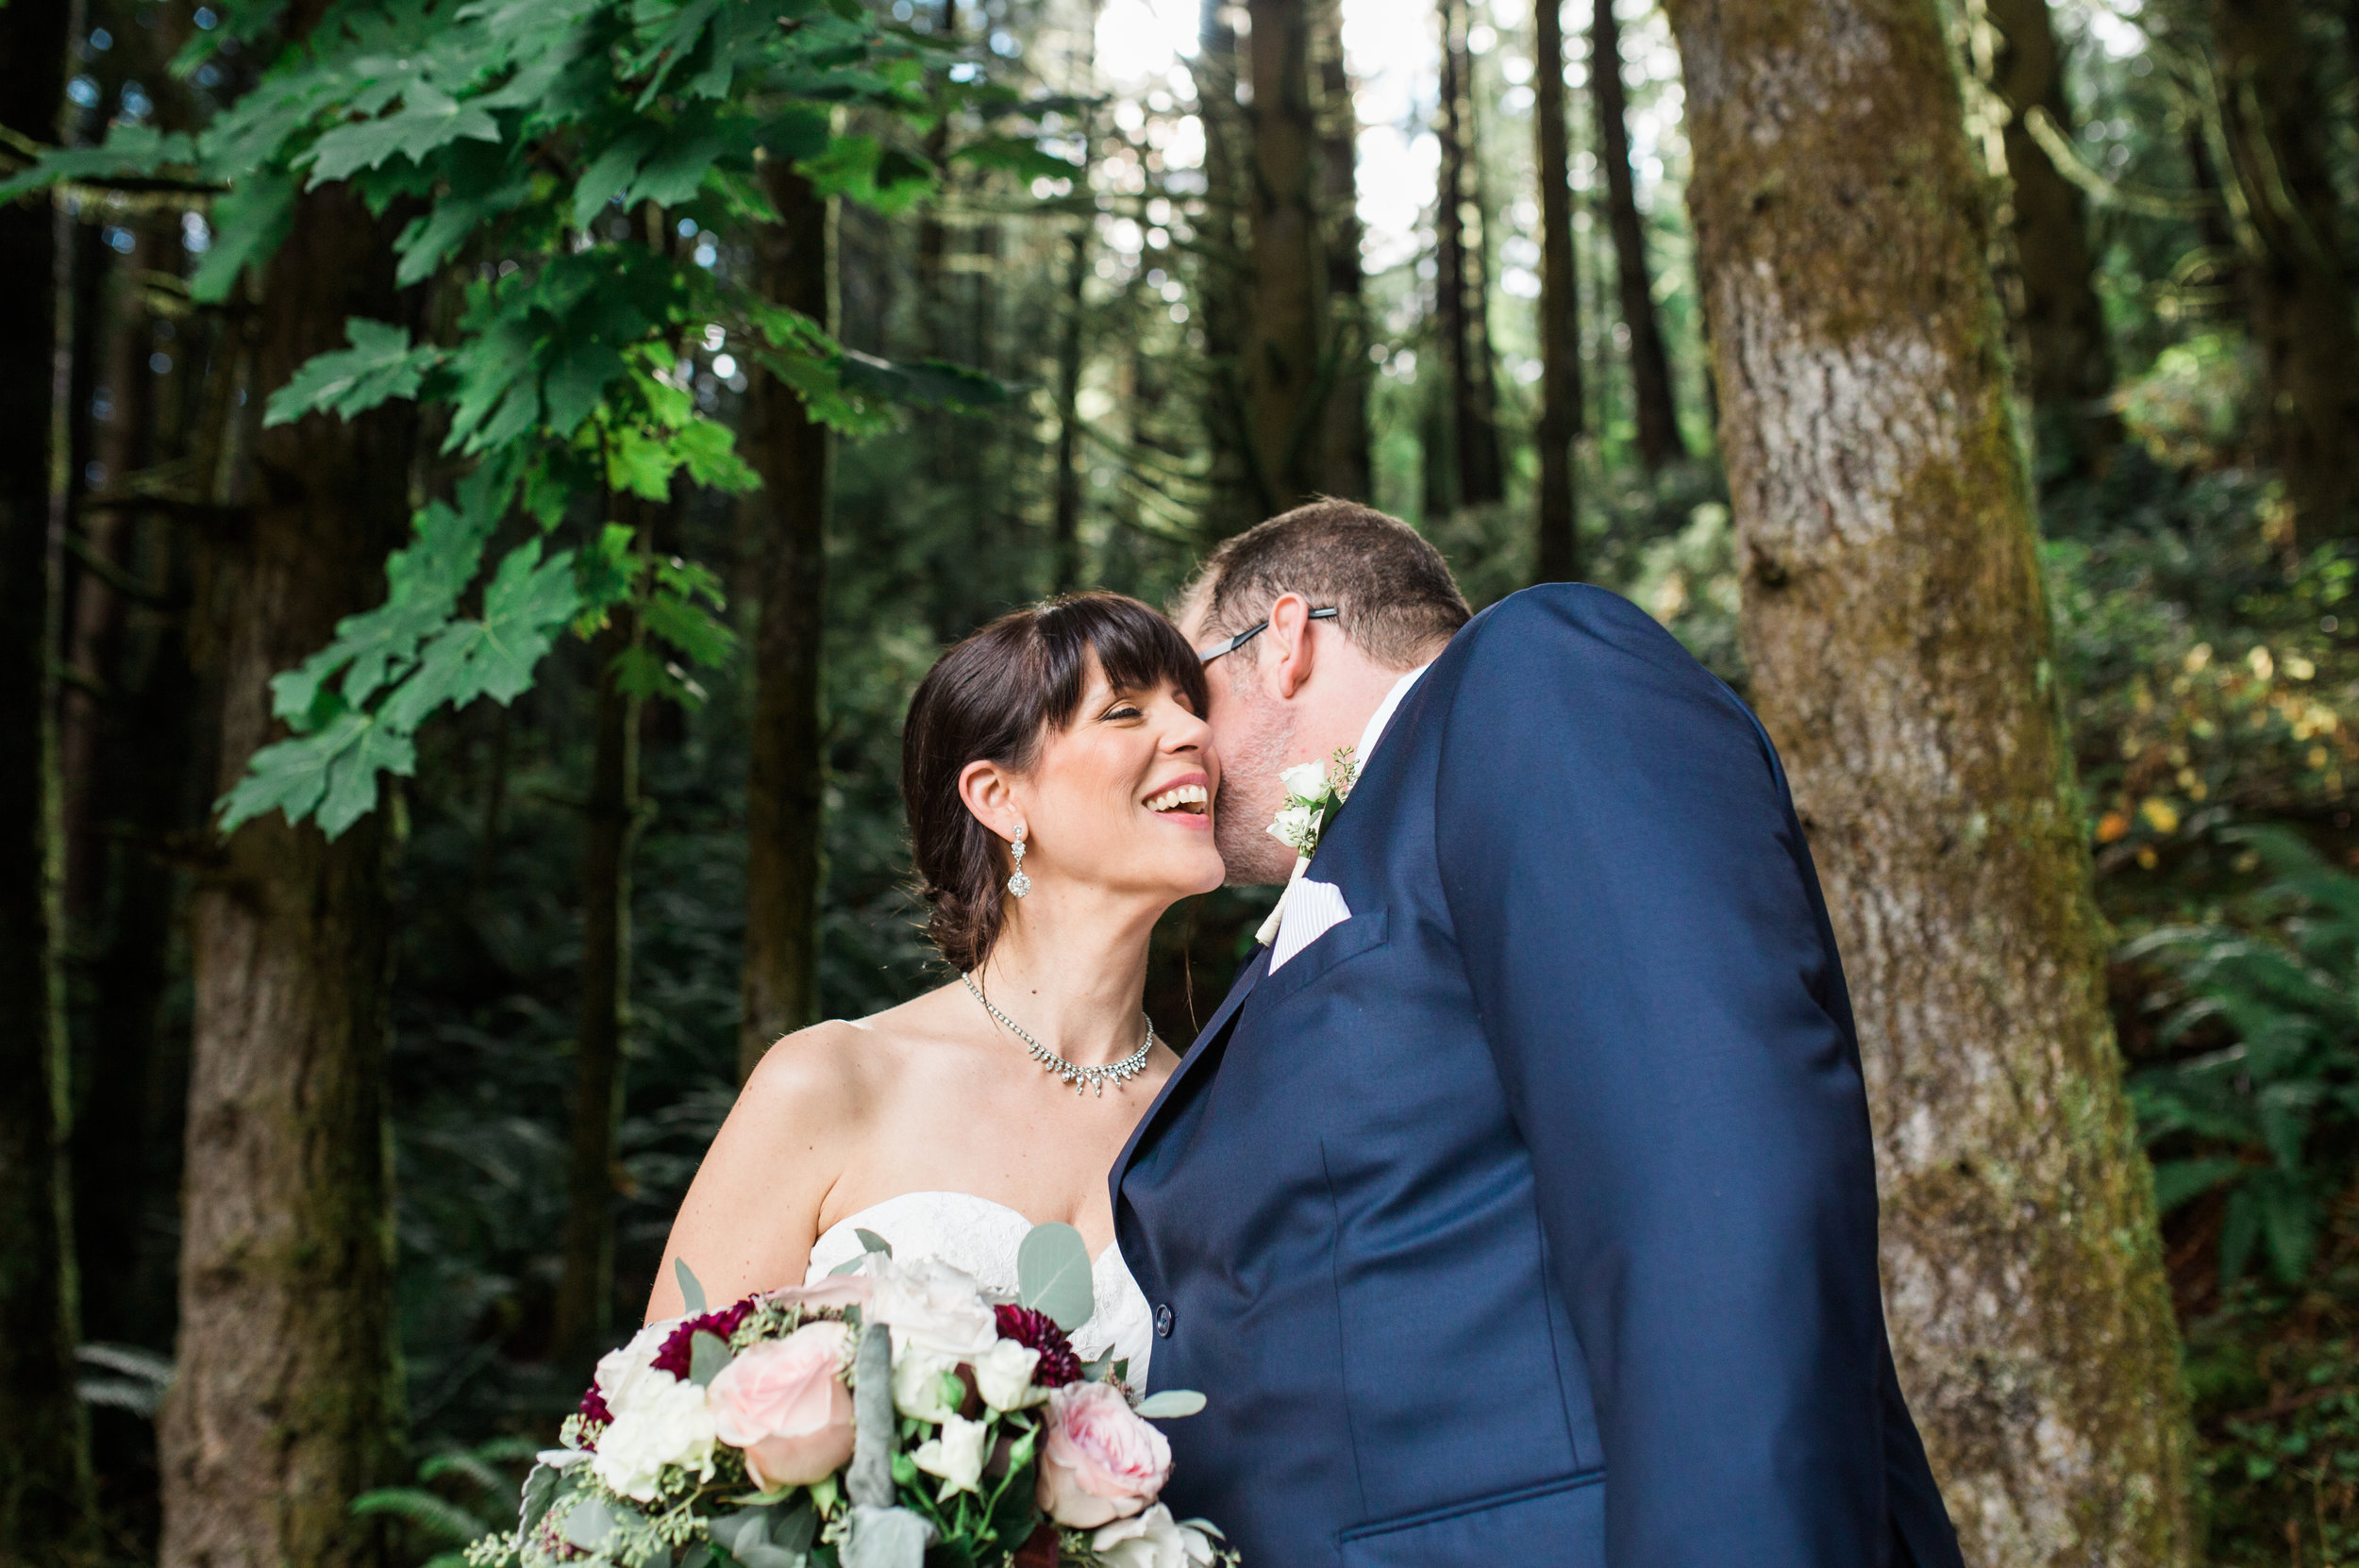 Grouse Mountain Wedding, Vancouver Wedding Photographer, Jennifer Picard Photography, Cleveland Dam Wedding